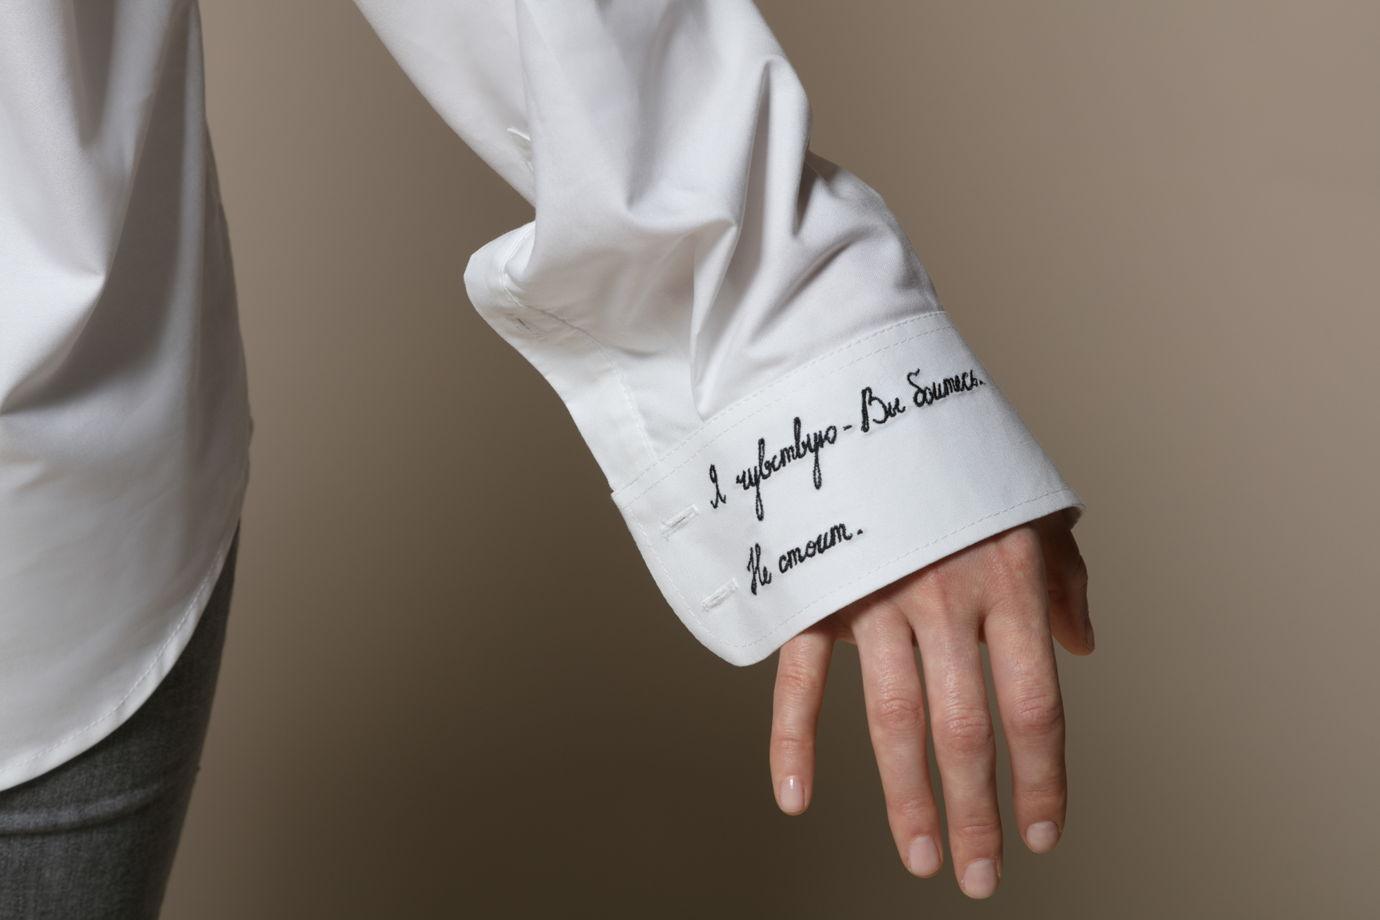 Белая рубашка с вышивкой на манжете и рукаве